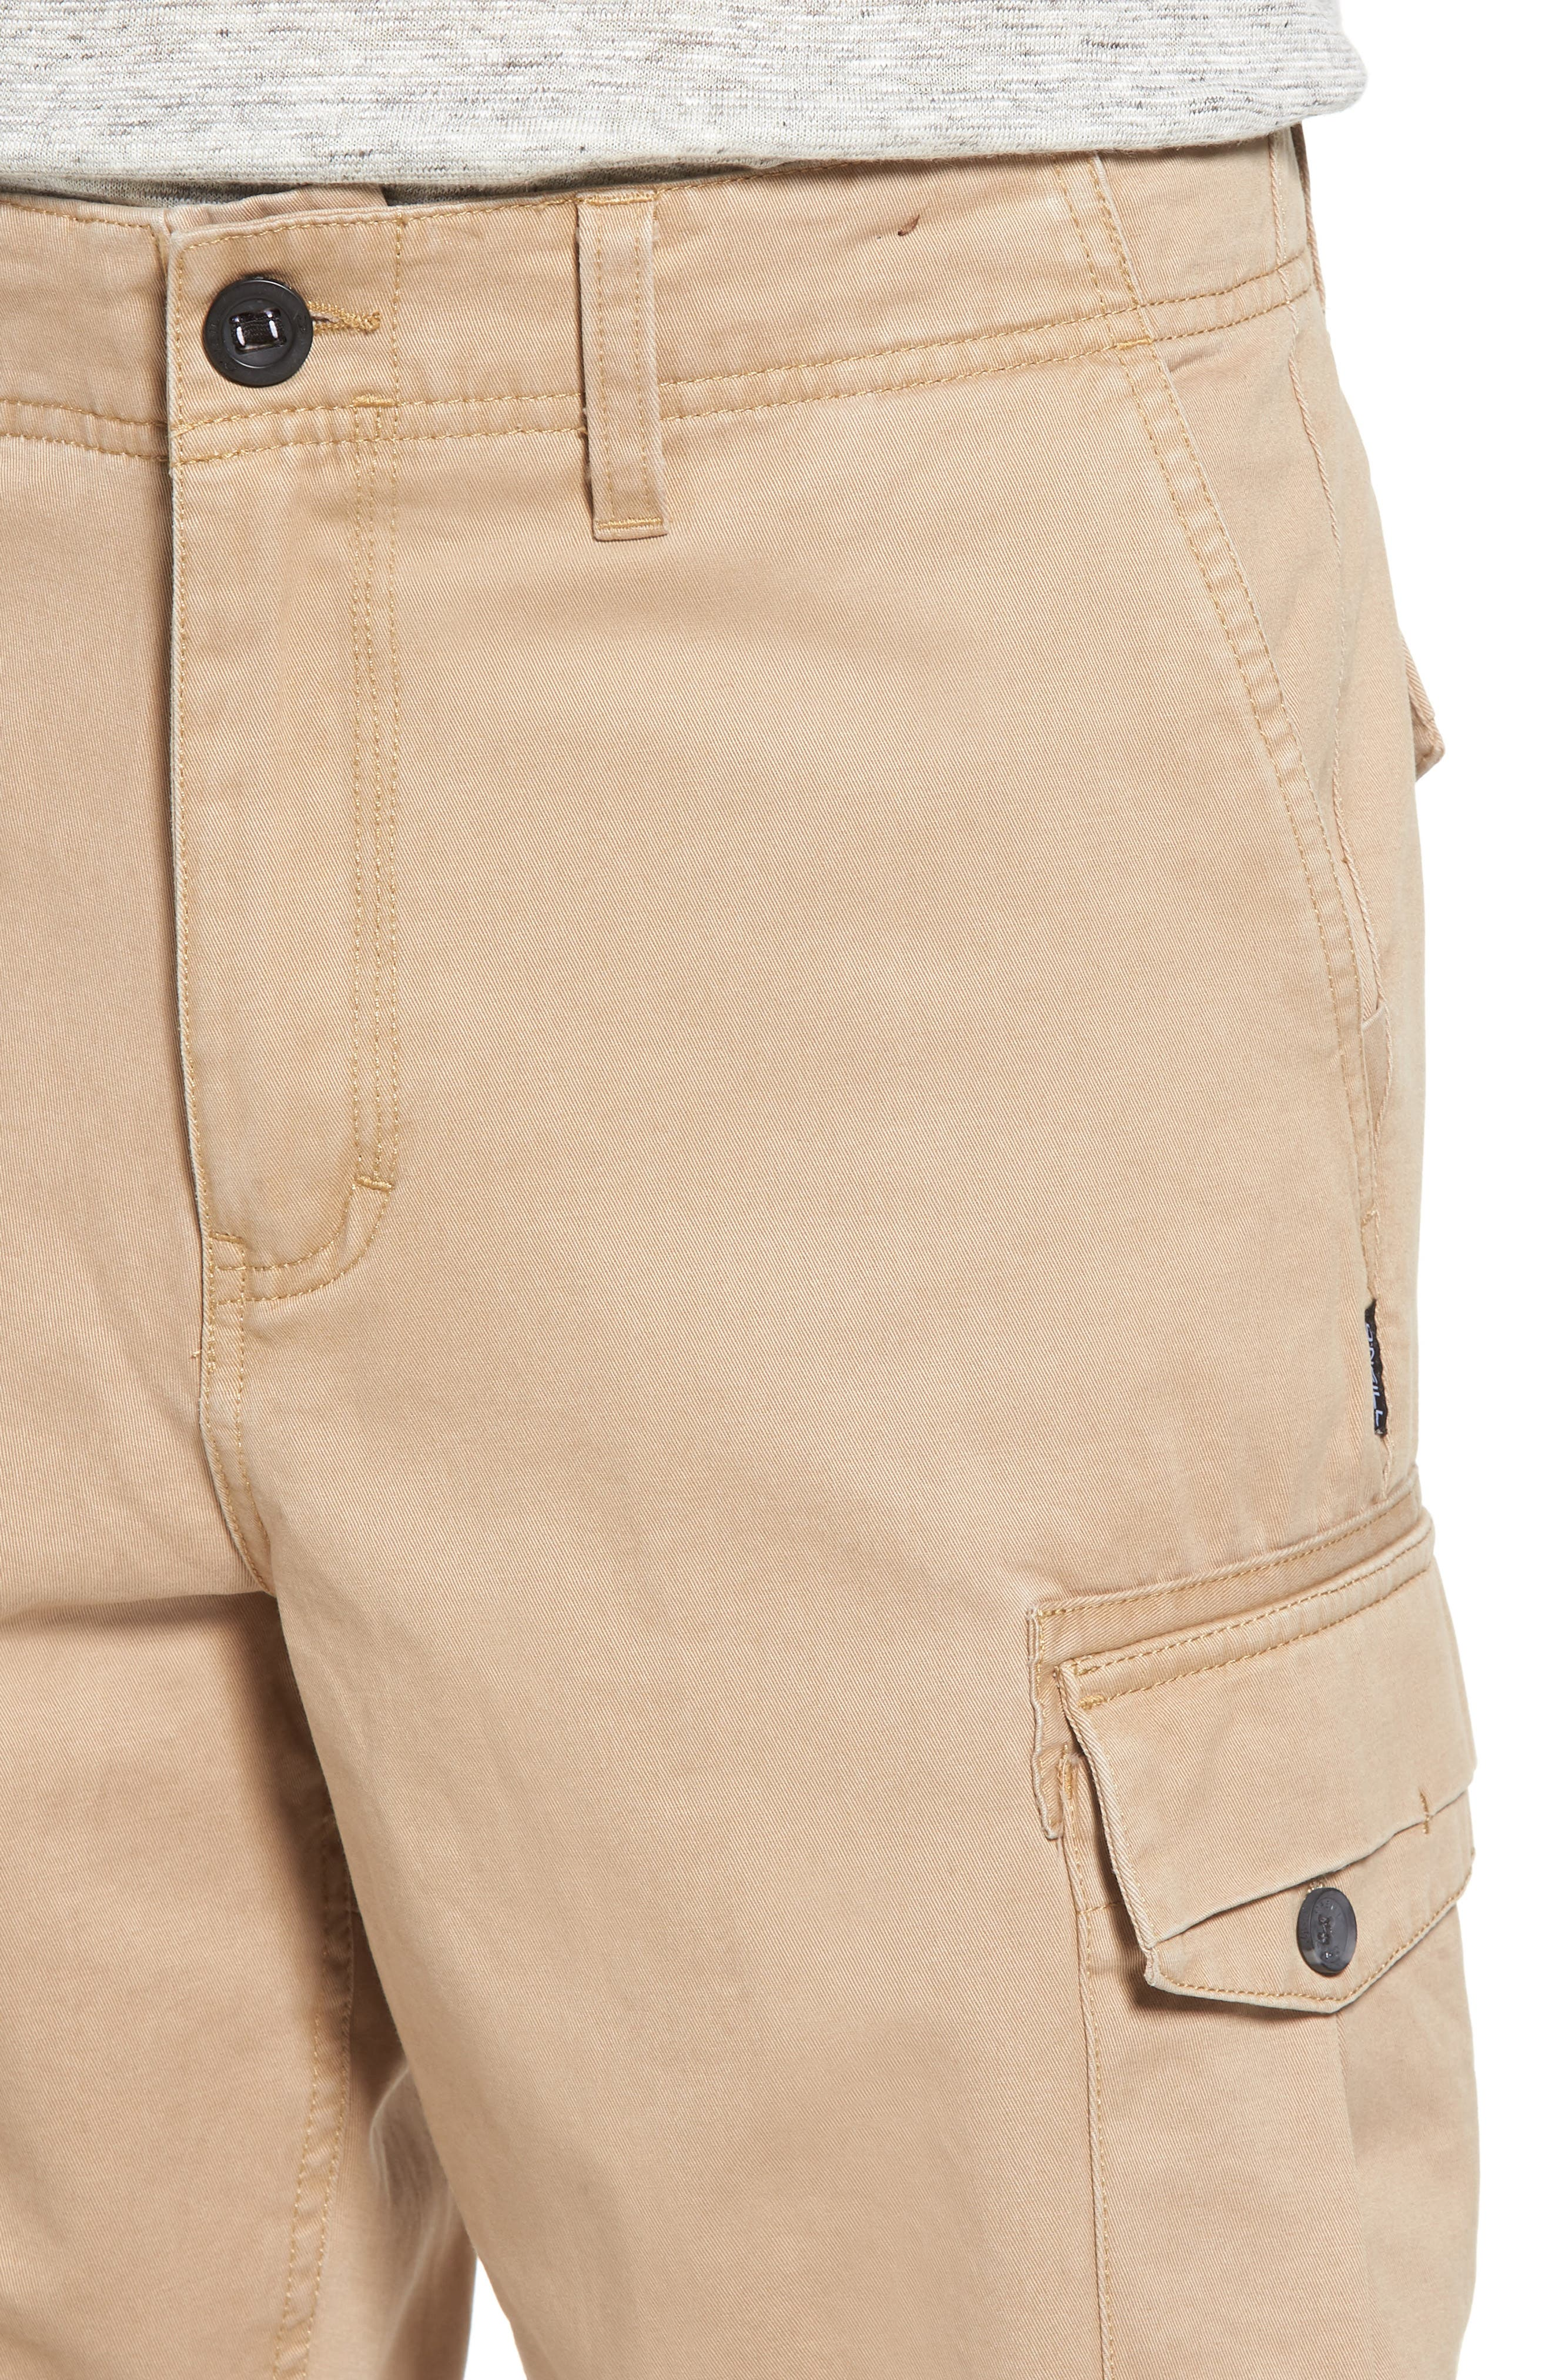 Campbell Cargo Shorts,                             Alternate thumbnail 4, color,                             Khaki